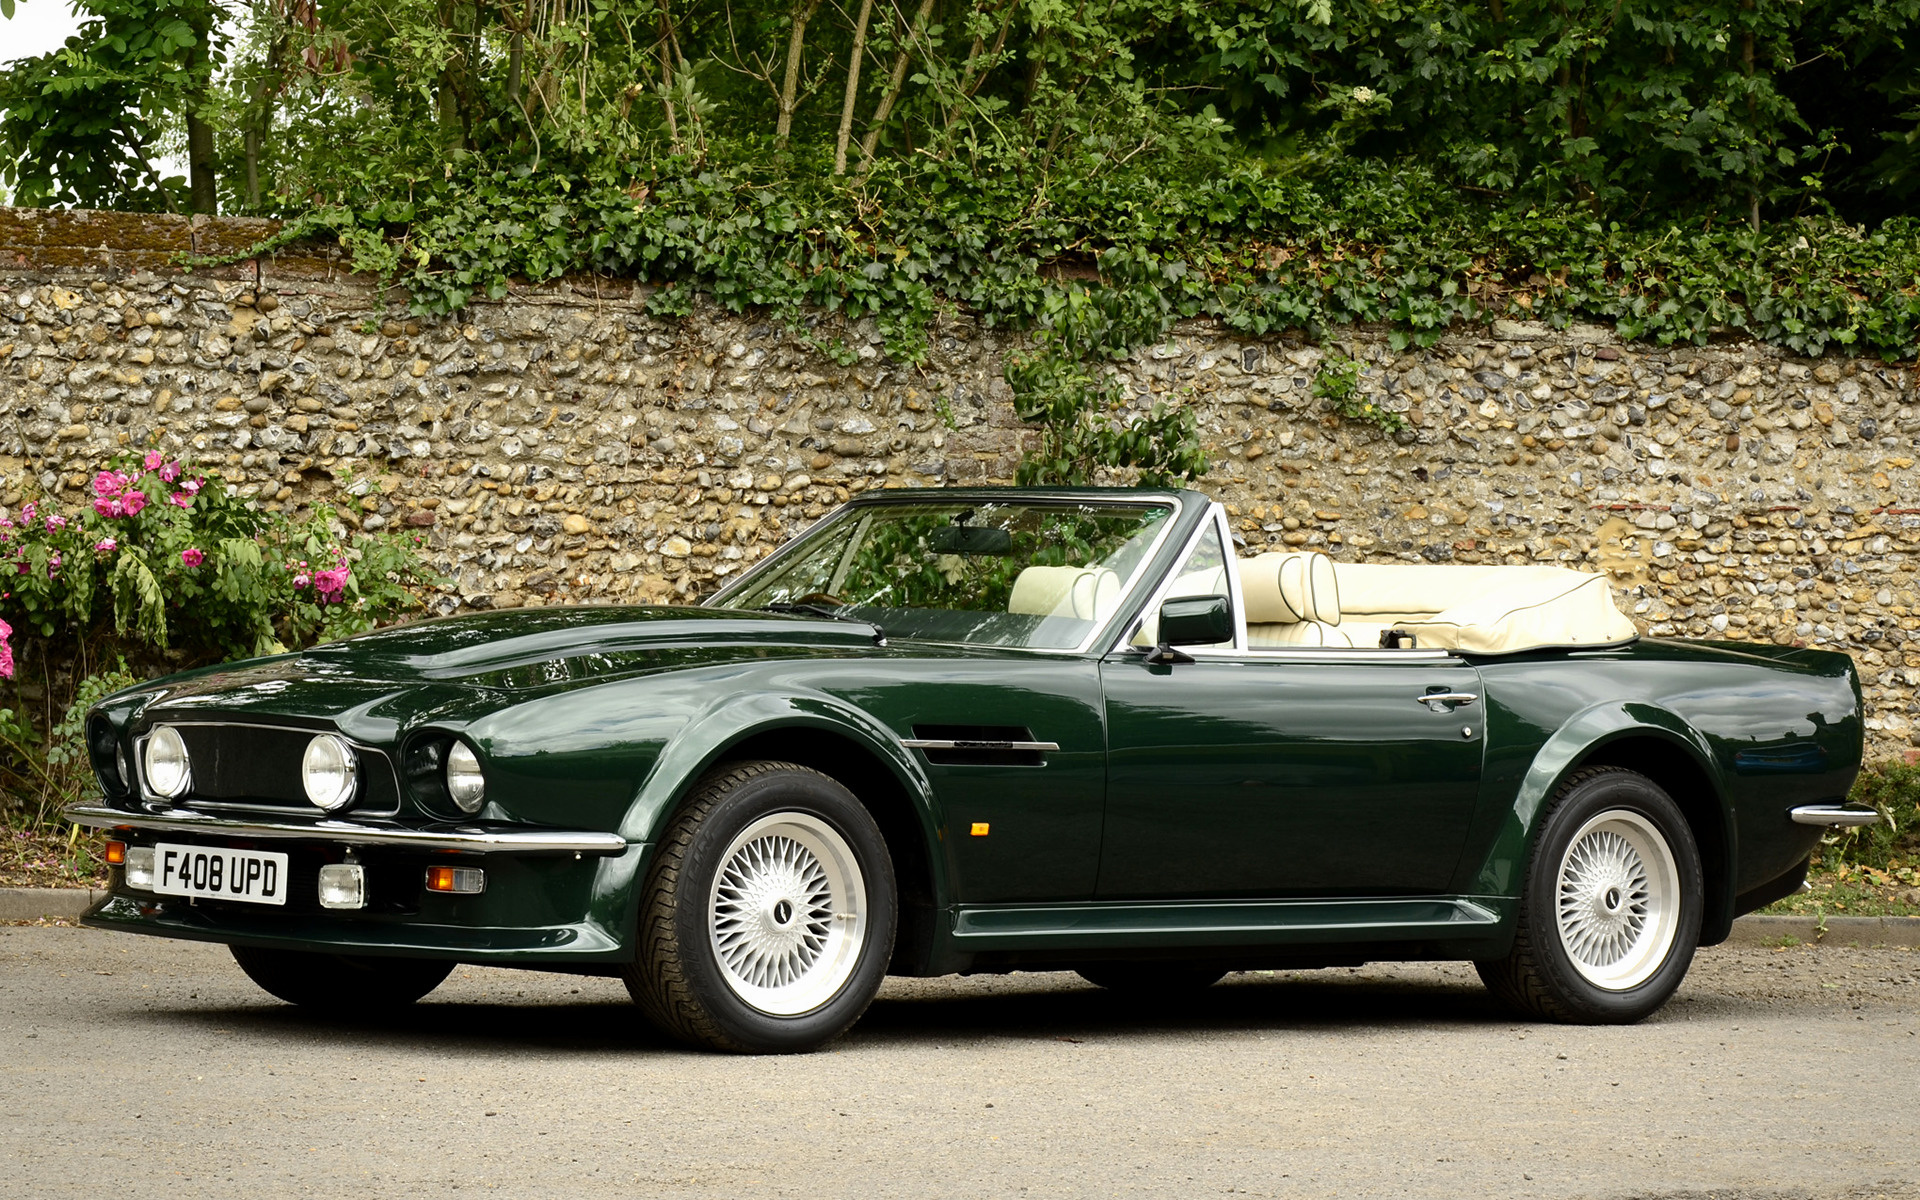 Aston Martin V Vantage Volante UK Wallpapers And HD Images - 1986 aston martin vantage